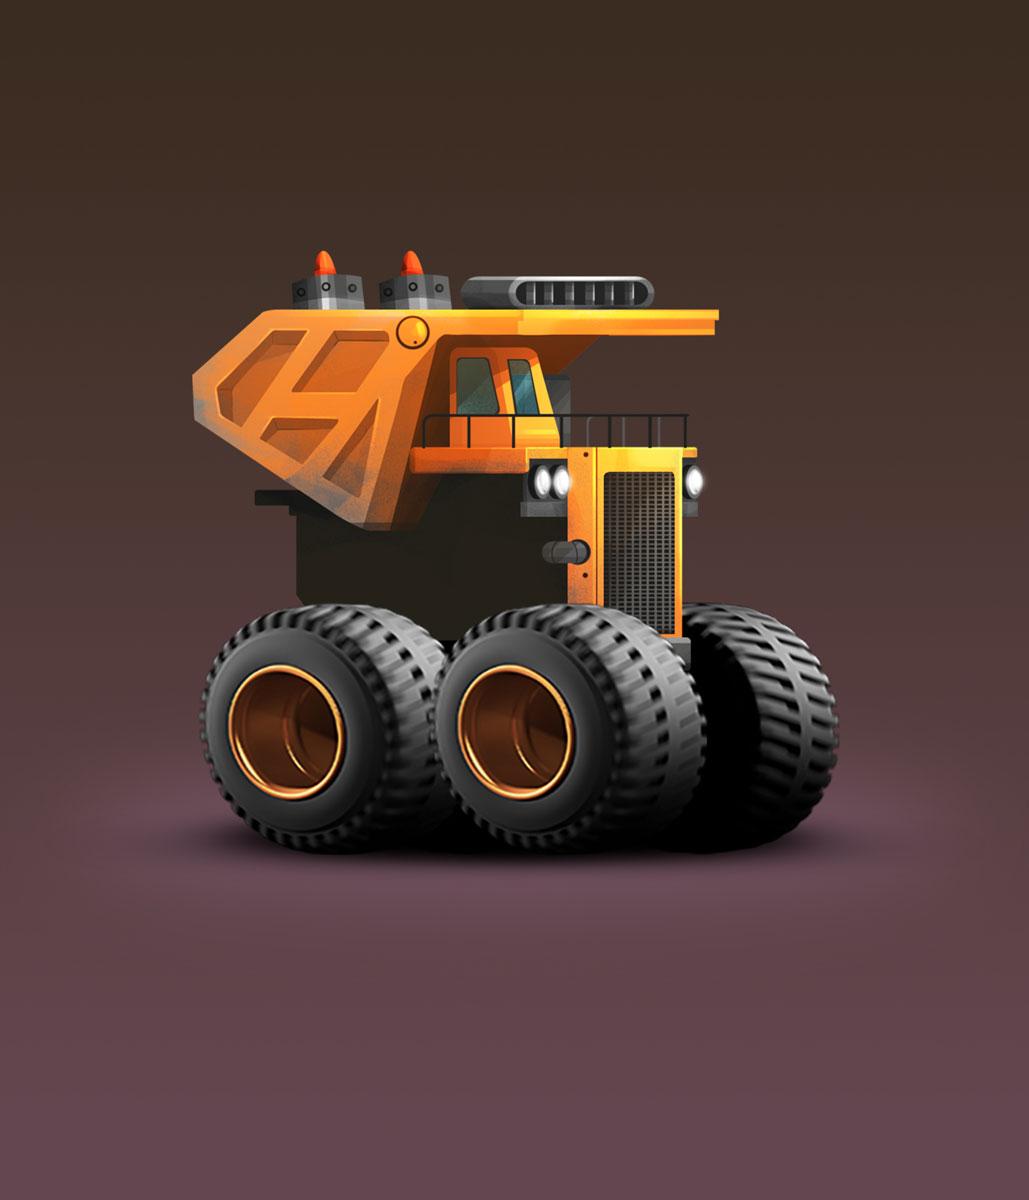 Old Truck Minimalist Design Game Car Design 2